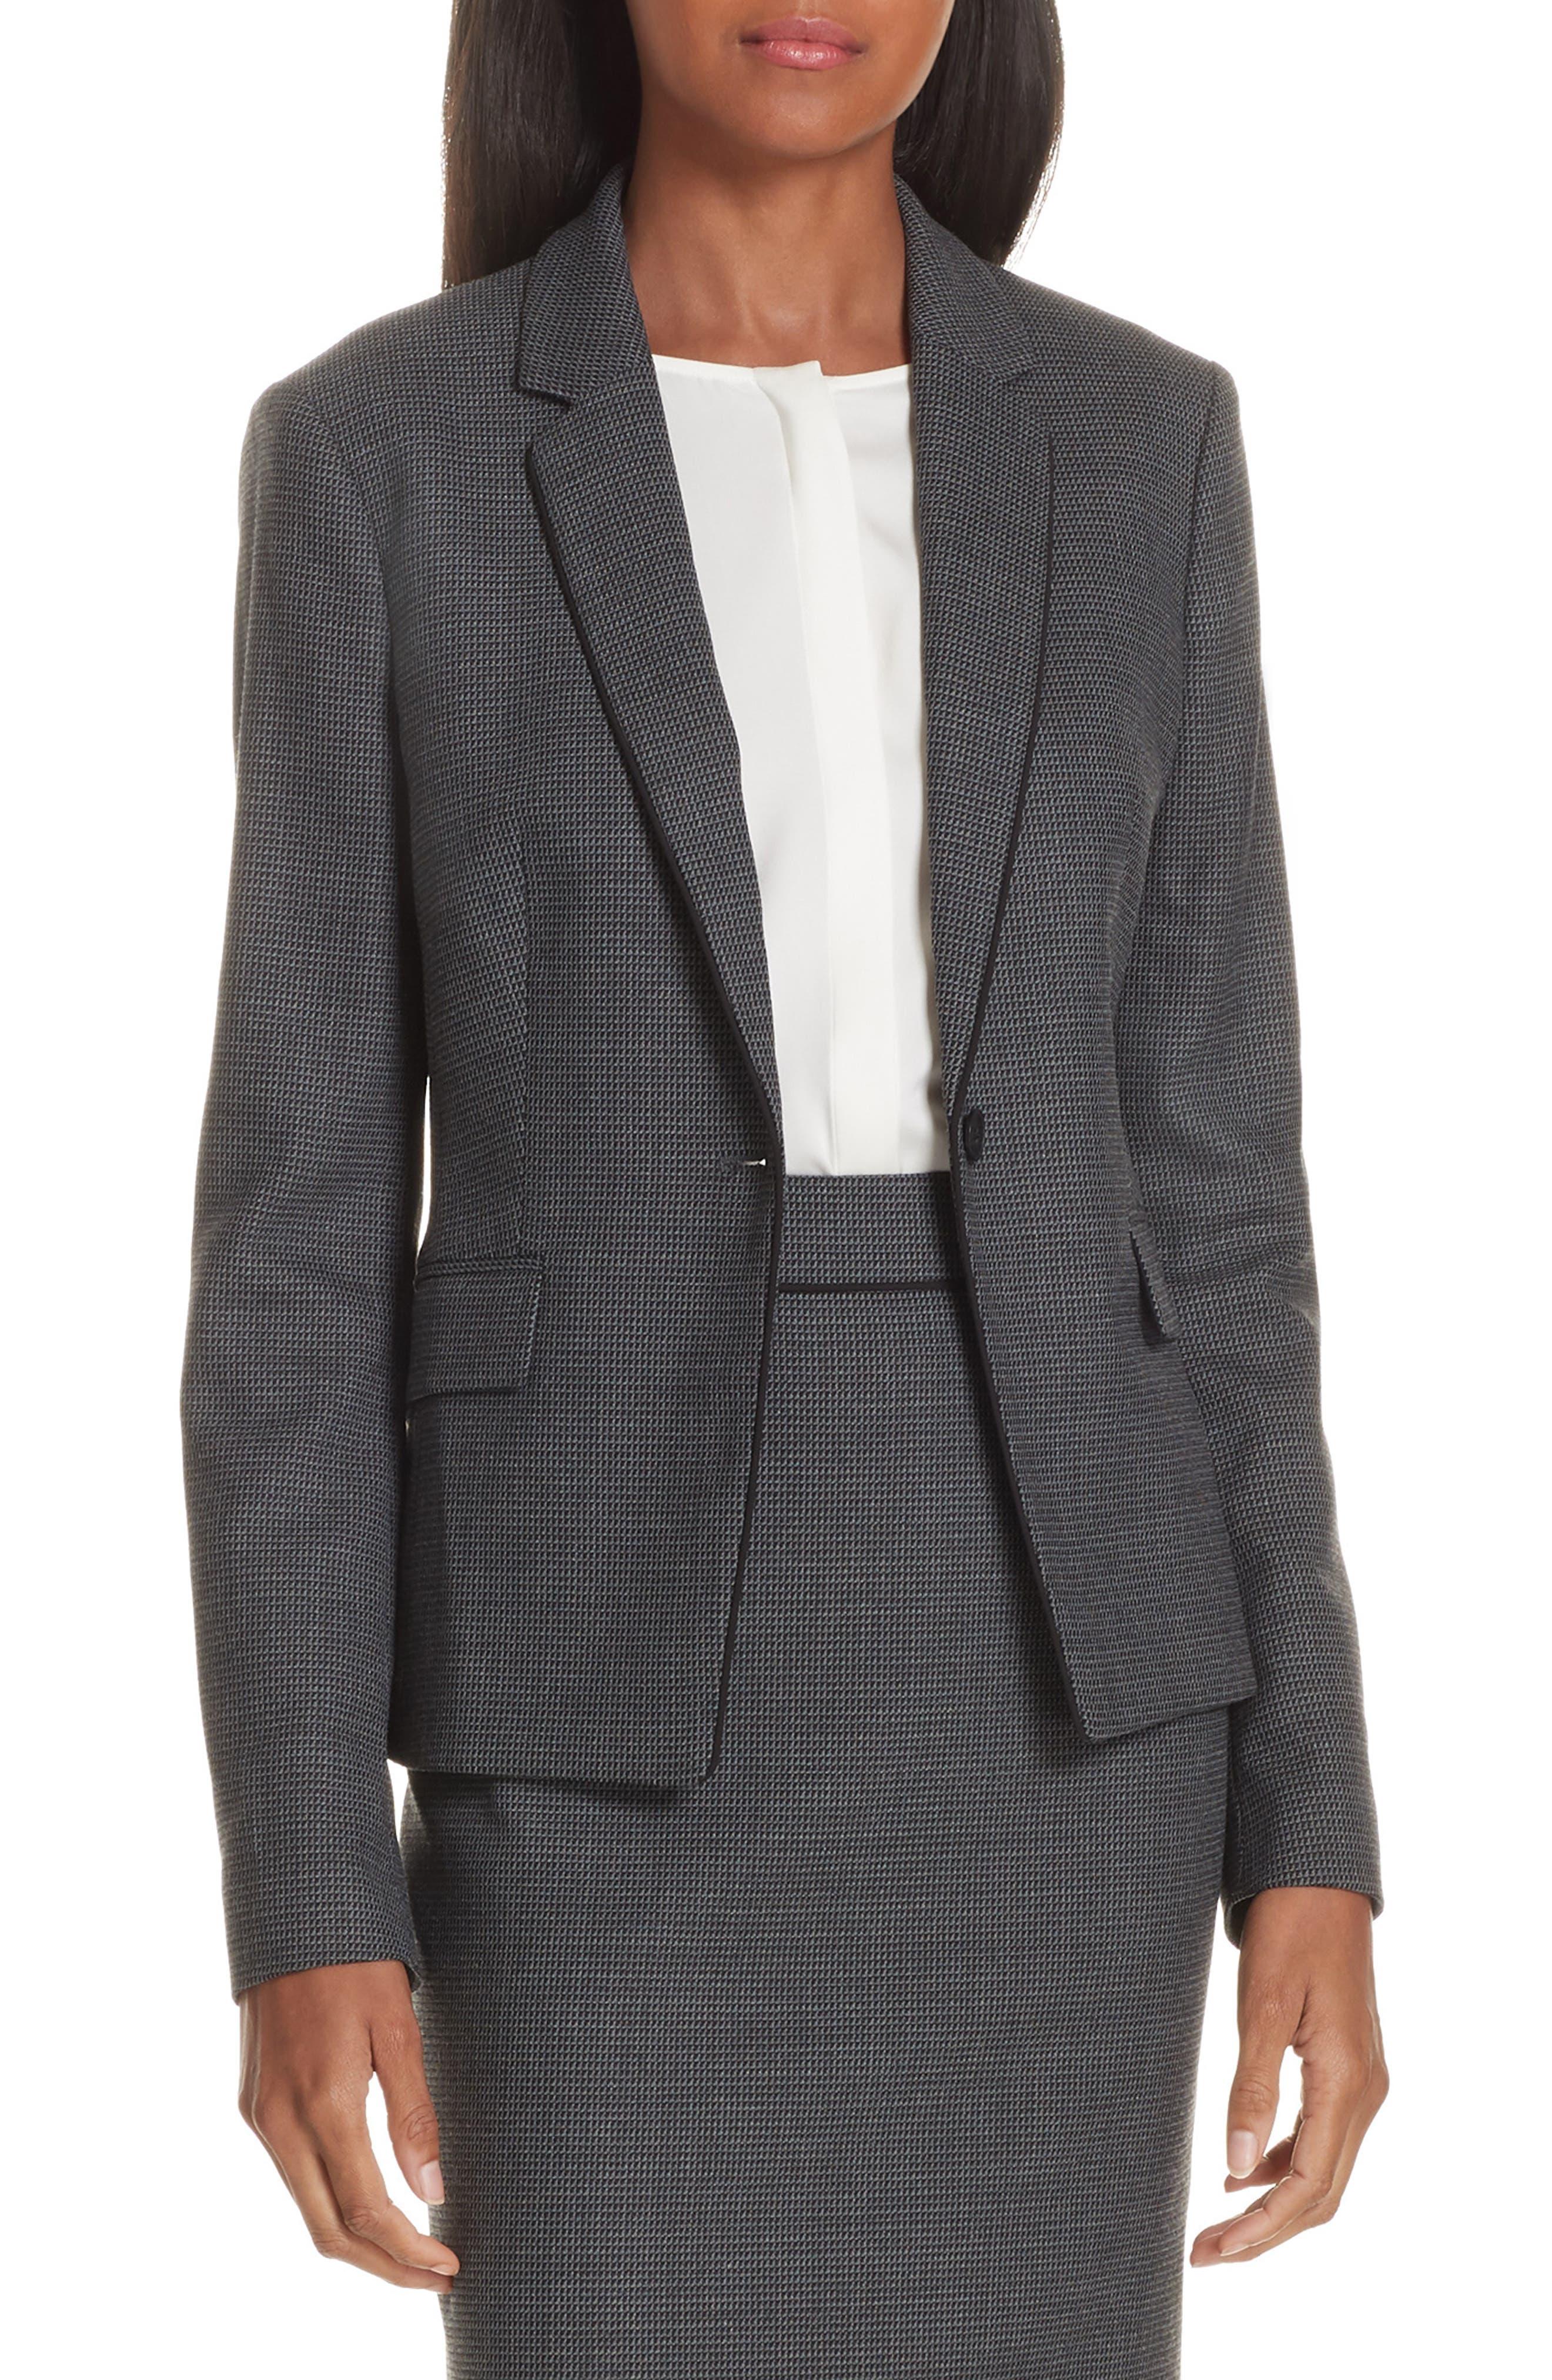 Jorita Geometric Wool Blend Suit Jacket,                         Main,                         color, GREY FANTASY